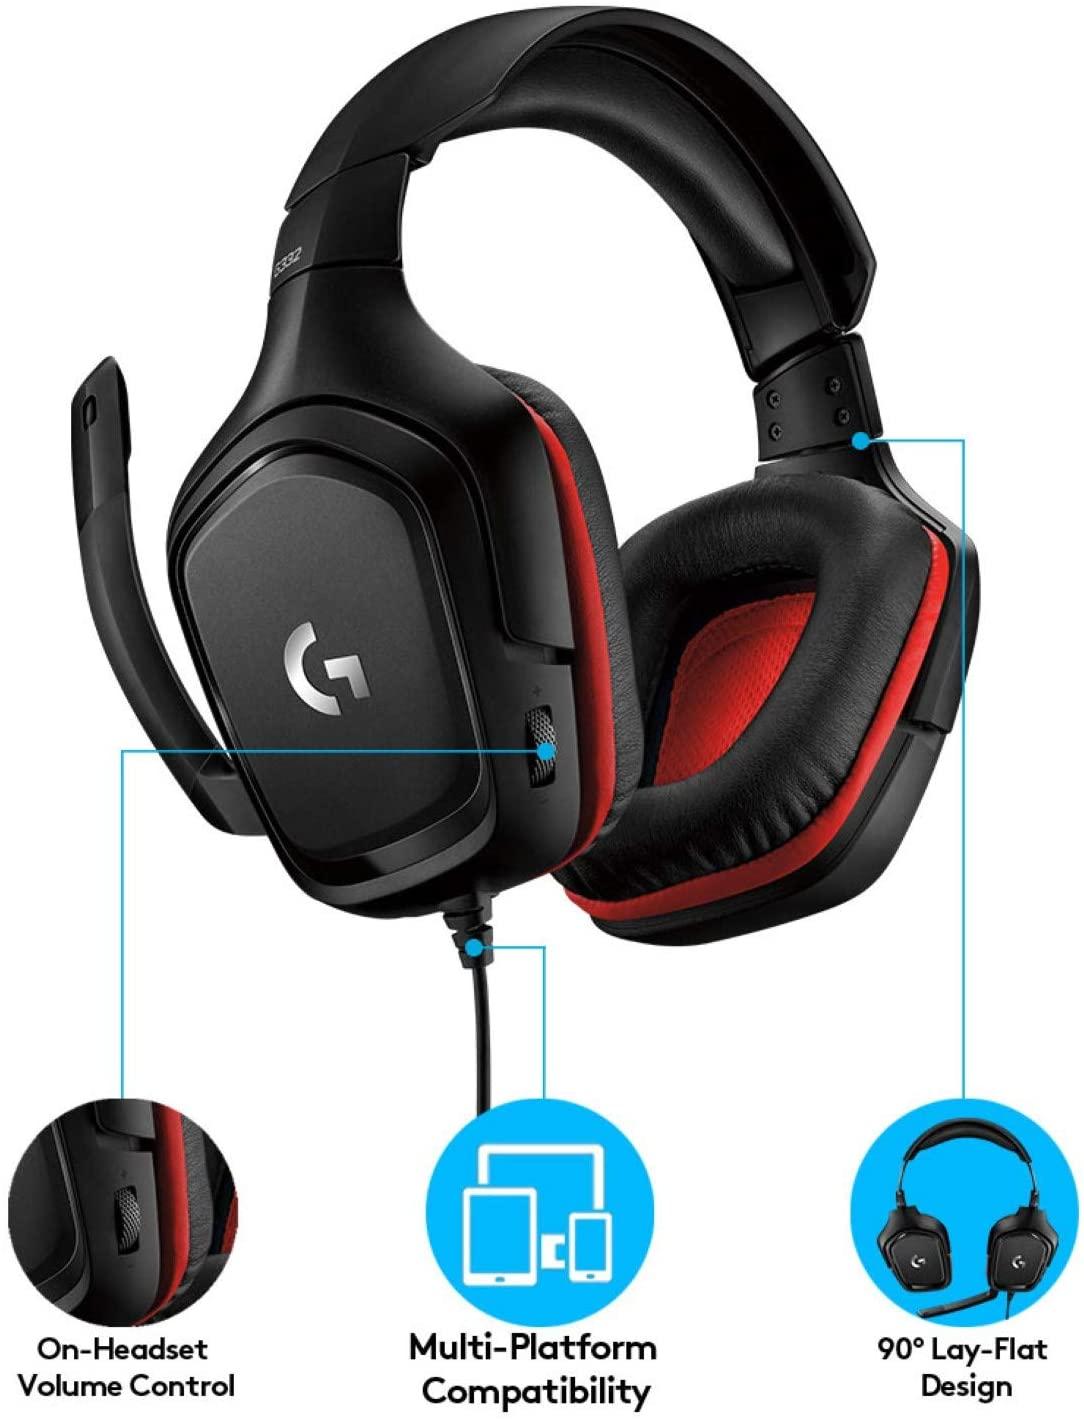 GAMING HEADSET G332  BLACK/RED 981-000757